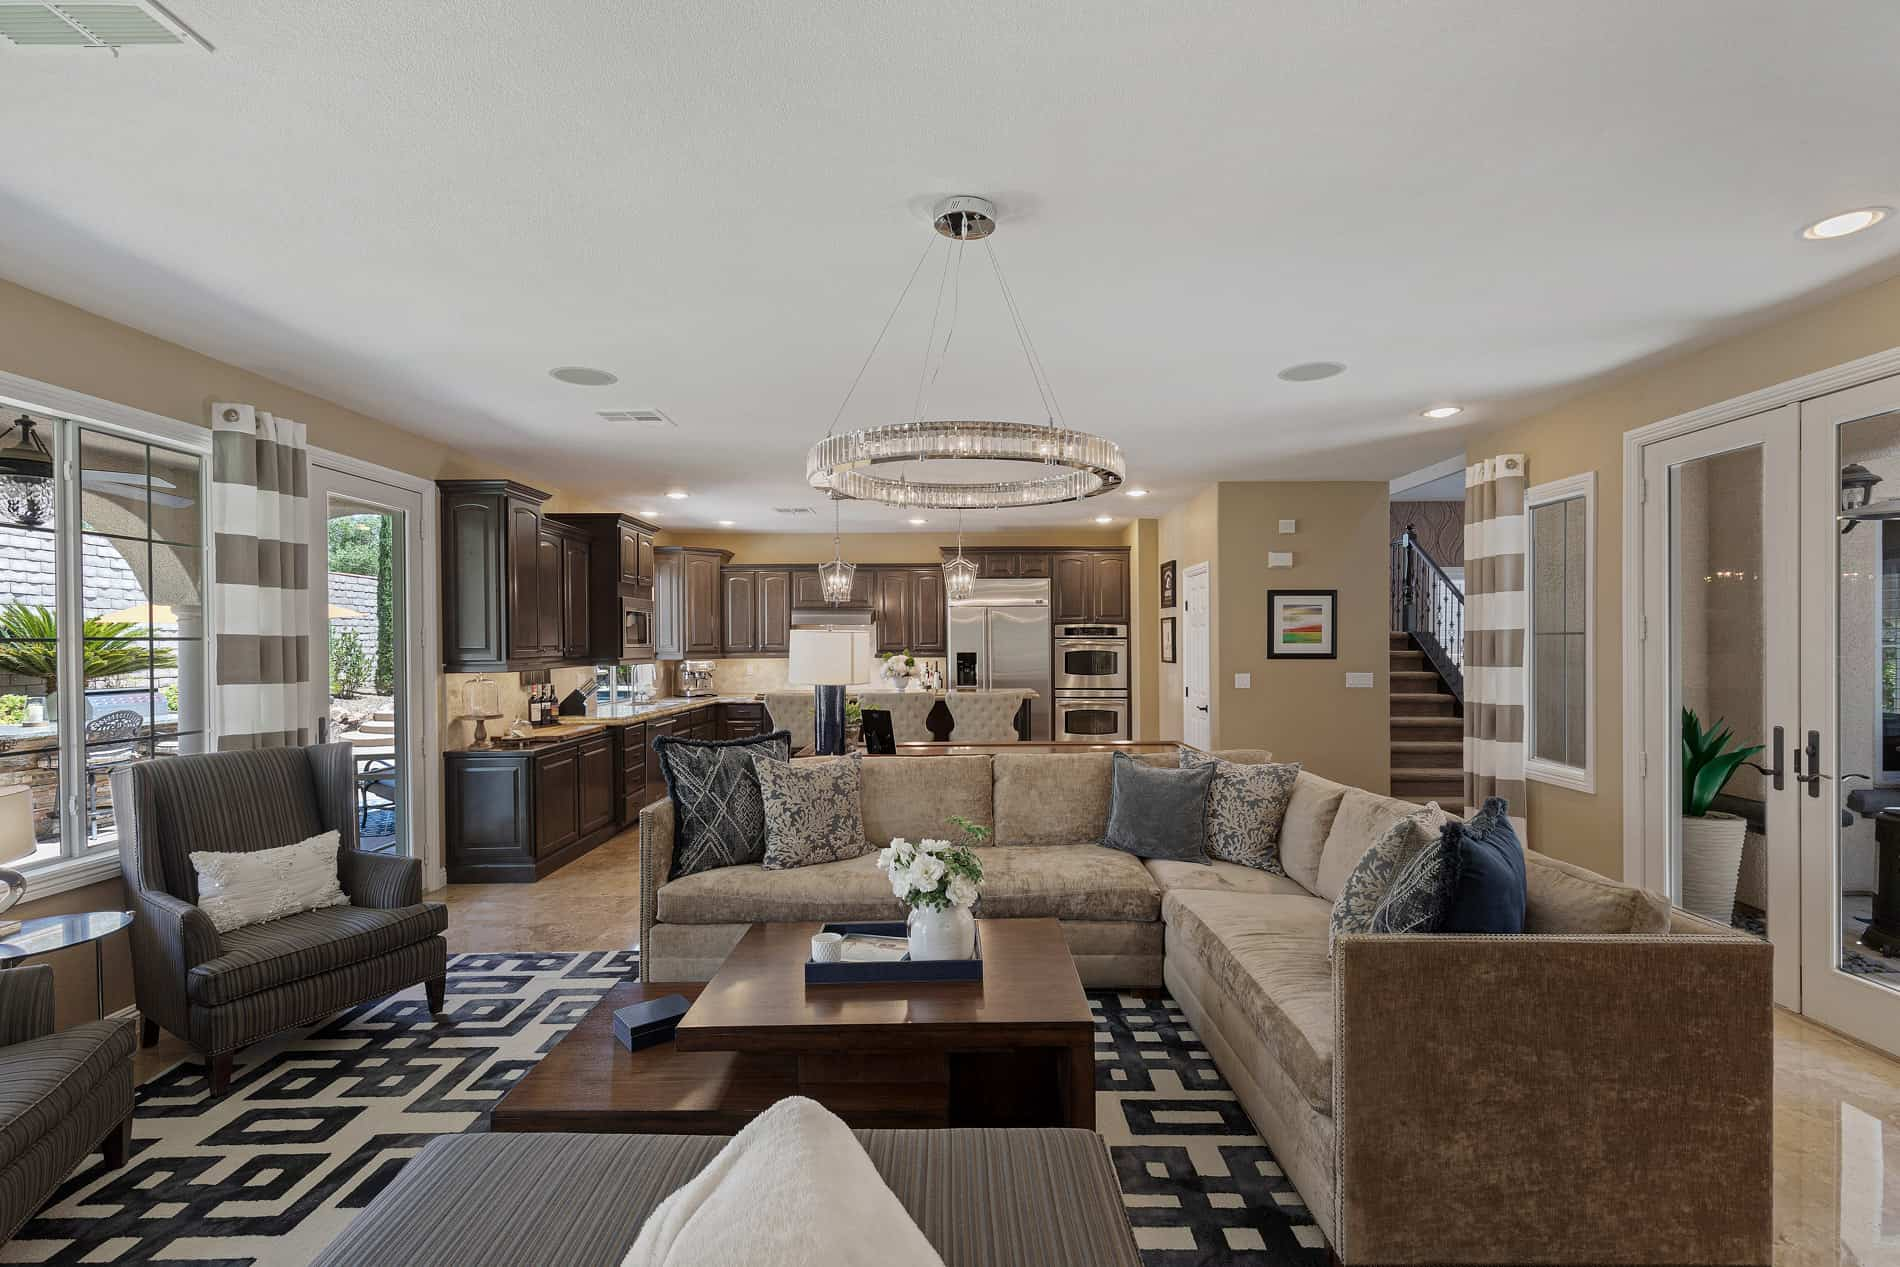 las-vegas-luxry-real-estate-realtor-rob-jensen-company-12108-vista-linda-avenue-the-paseos018